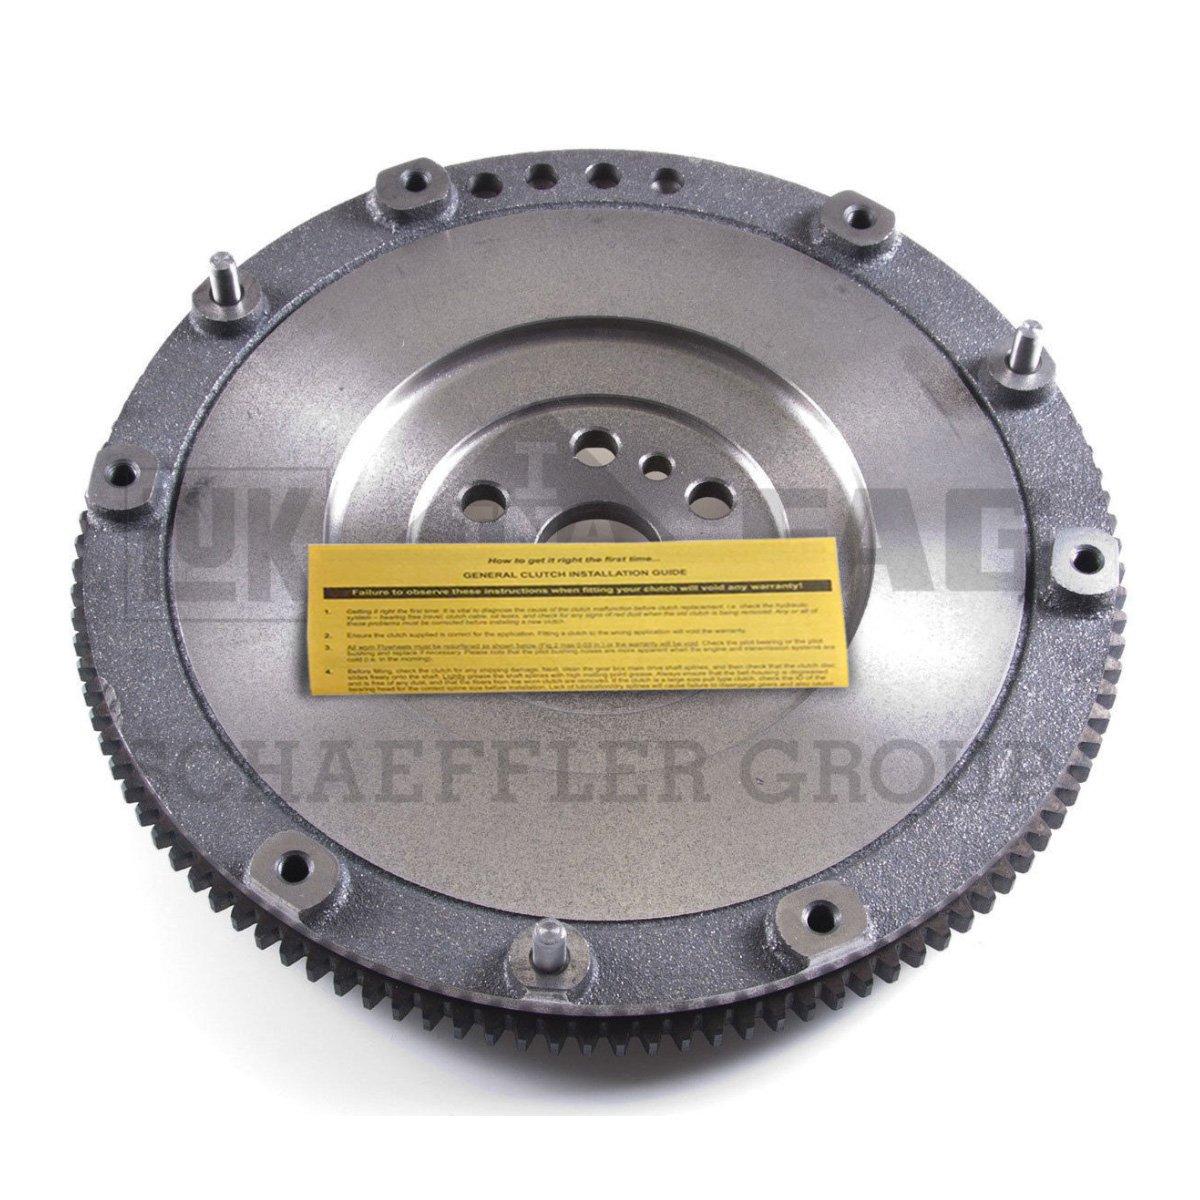 Amazon.com: EF HD NODULAR OE OEM FLYWHEEL 93-97 FORD PROBE 93-03 MAZDA 626 MX-6 PROTEGE 2.0L: Automotive